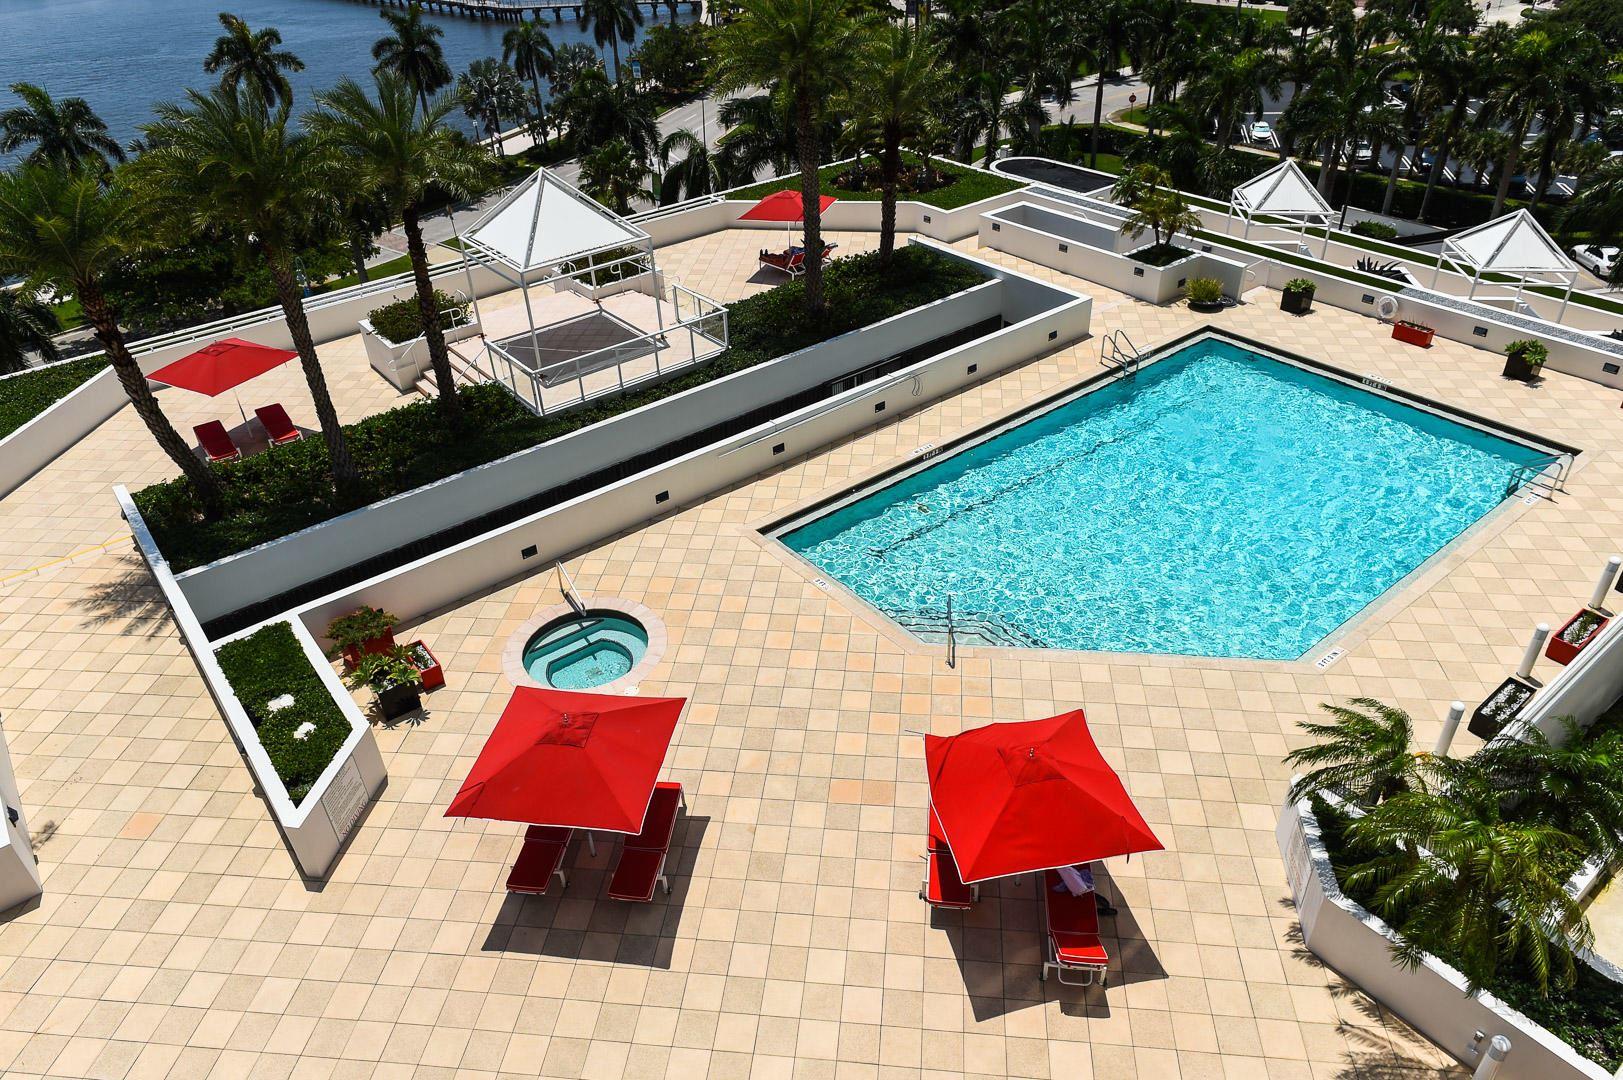 525 Flagler, West Palm Beach, 33401 Photo 1